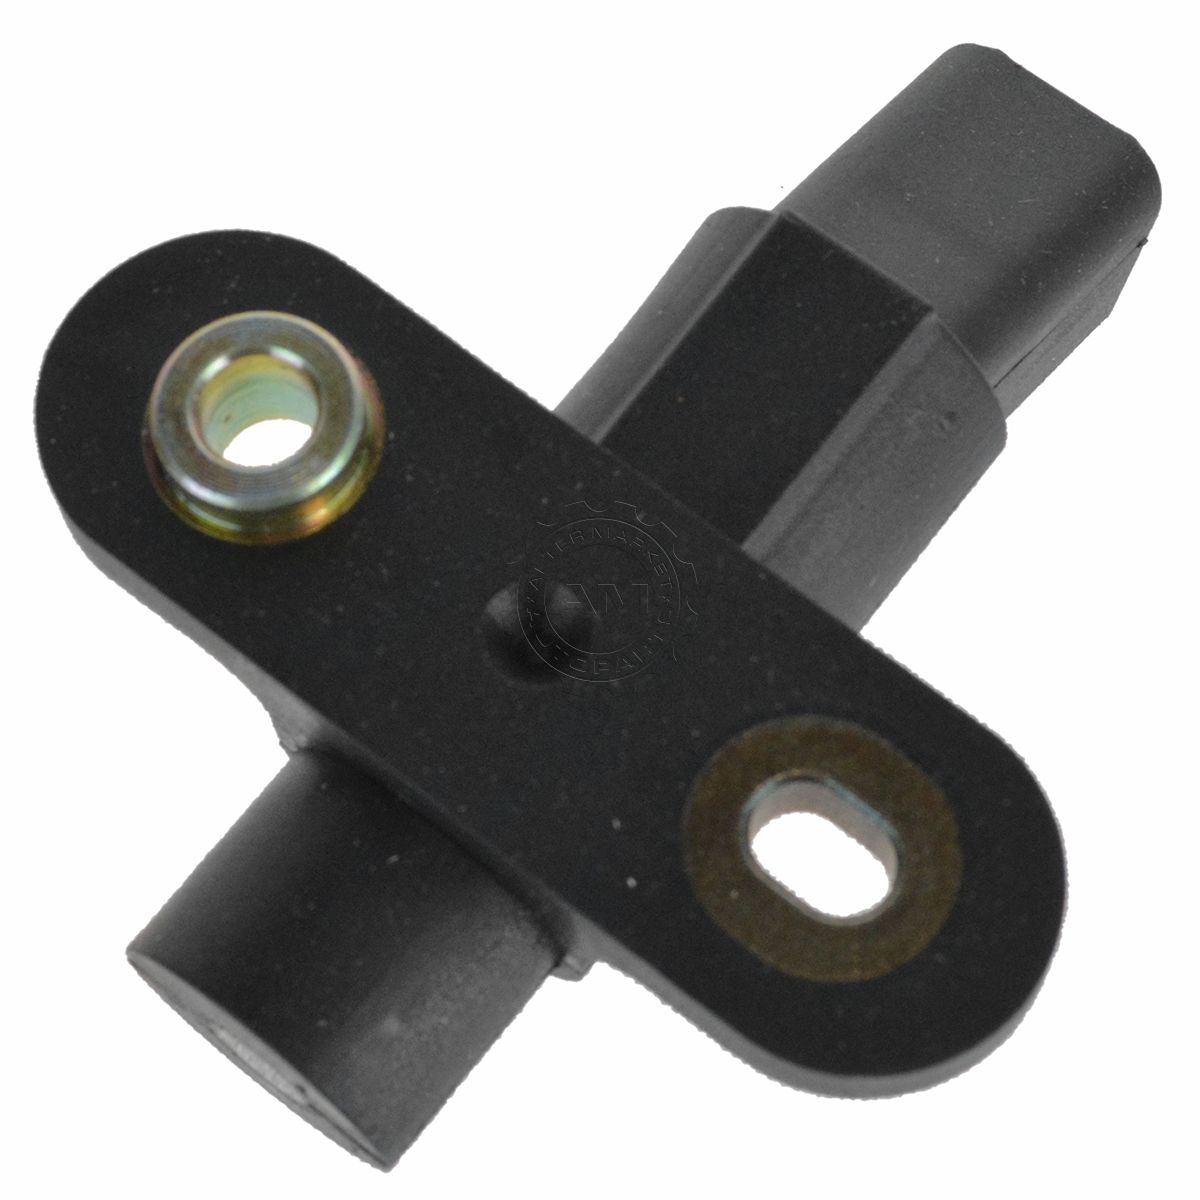 Crankshaft Position Sensor For Aerostar Ranger Taurus